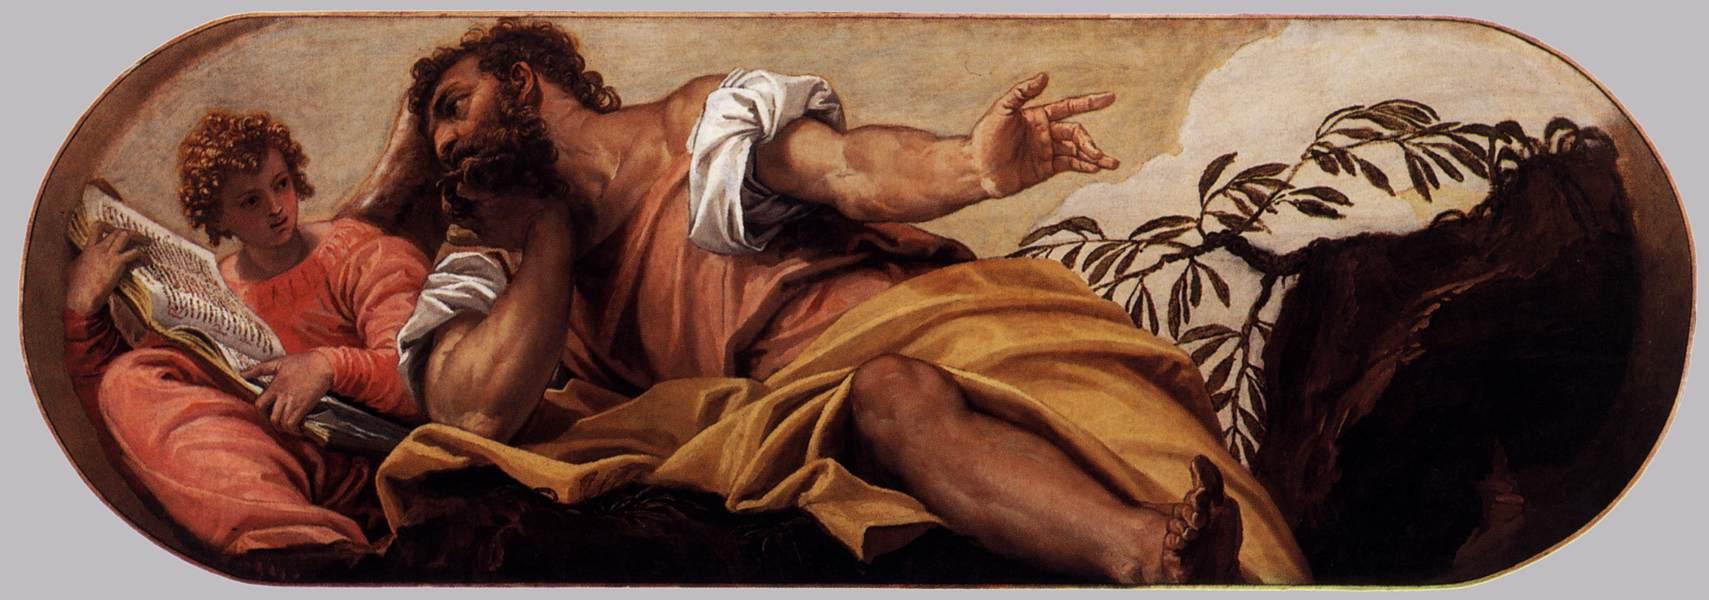 https://upload.wikimedia.org/wikipedia/commons/1/14/Paolo_Veronese_-_St_Matthew_-_WGA24799.jpg